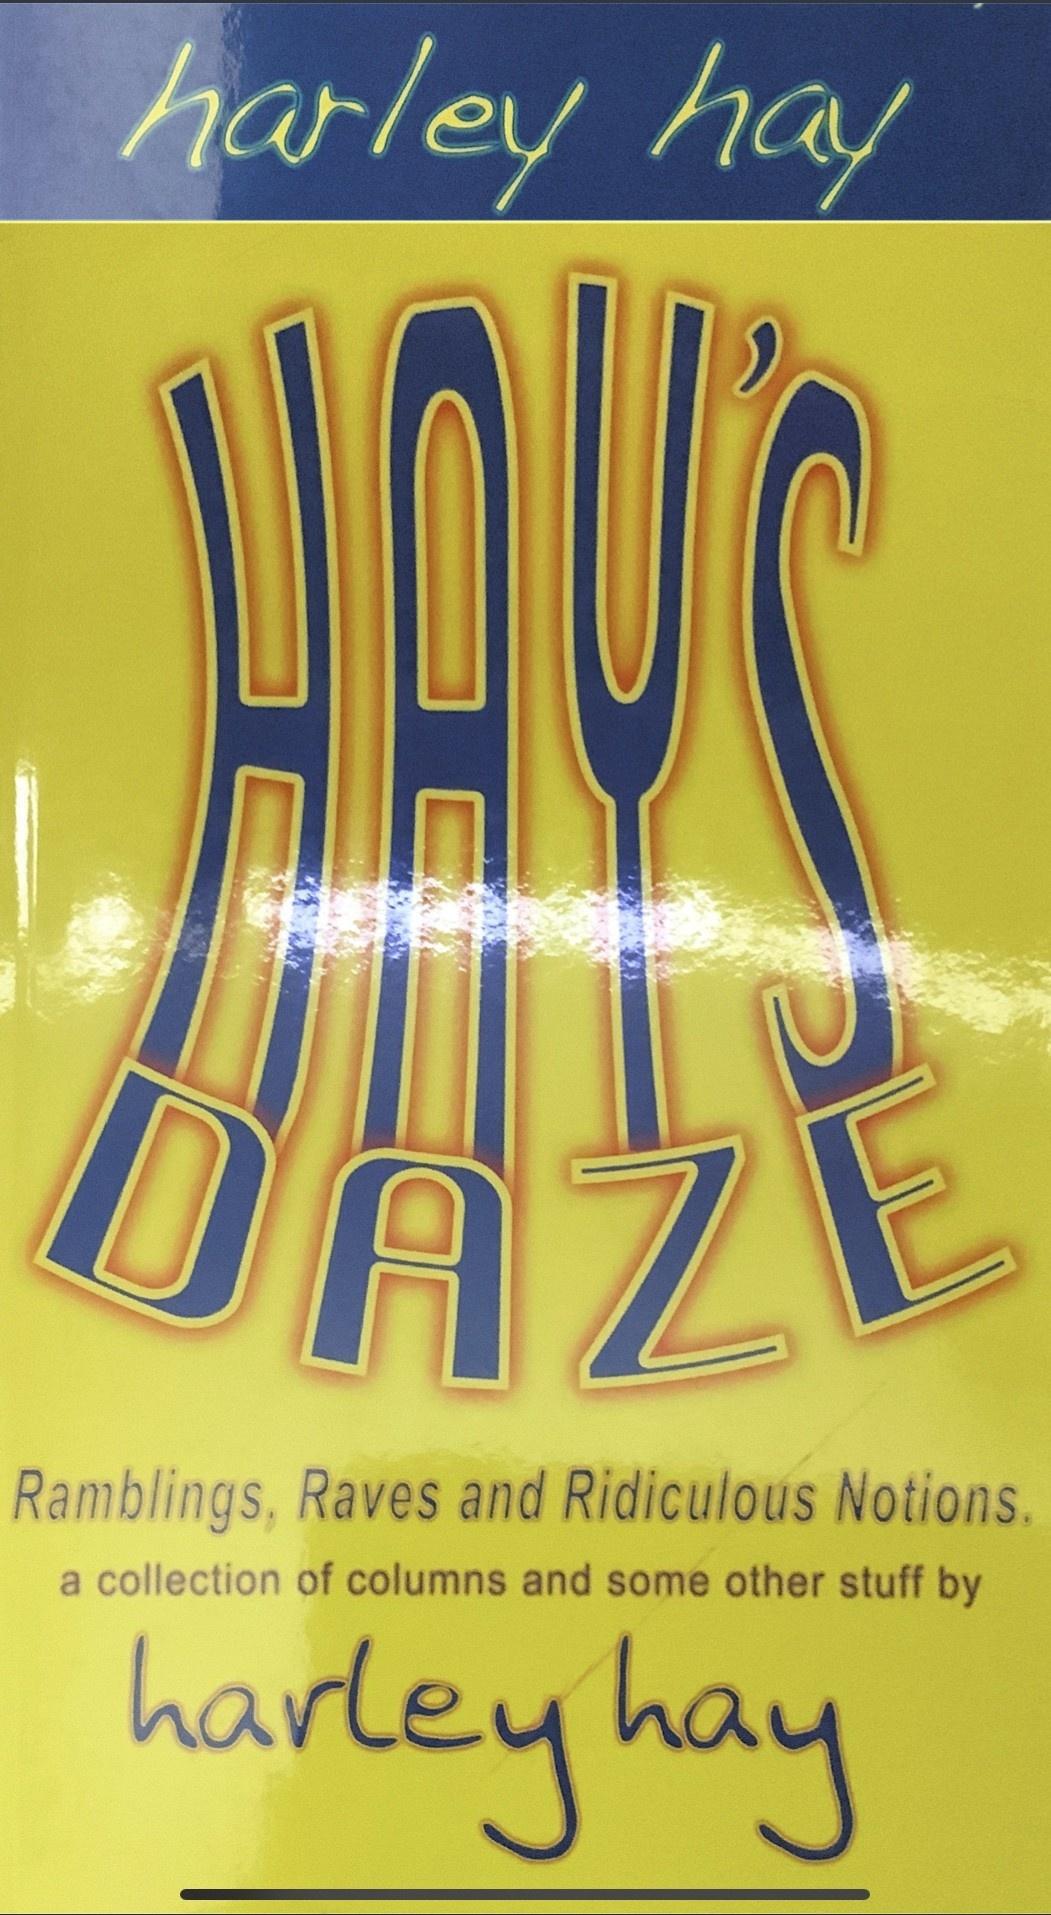 Hays Daze